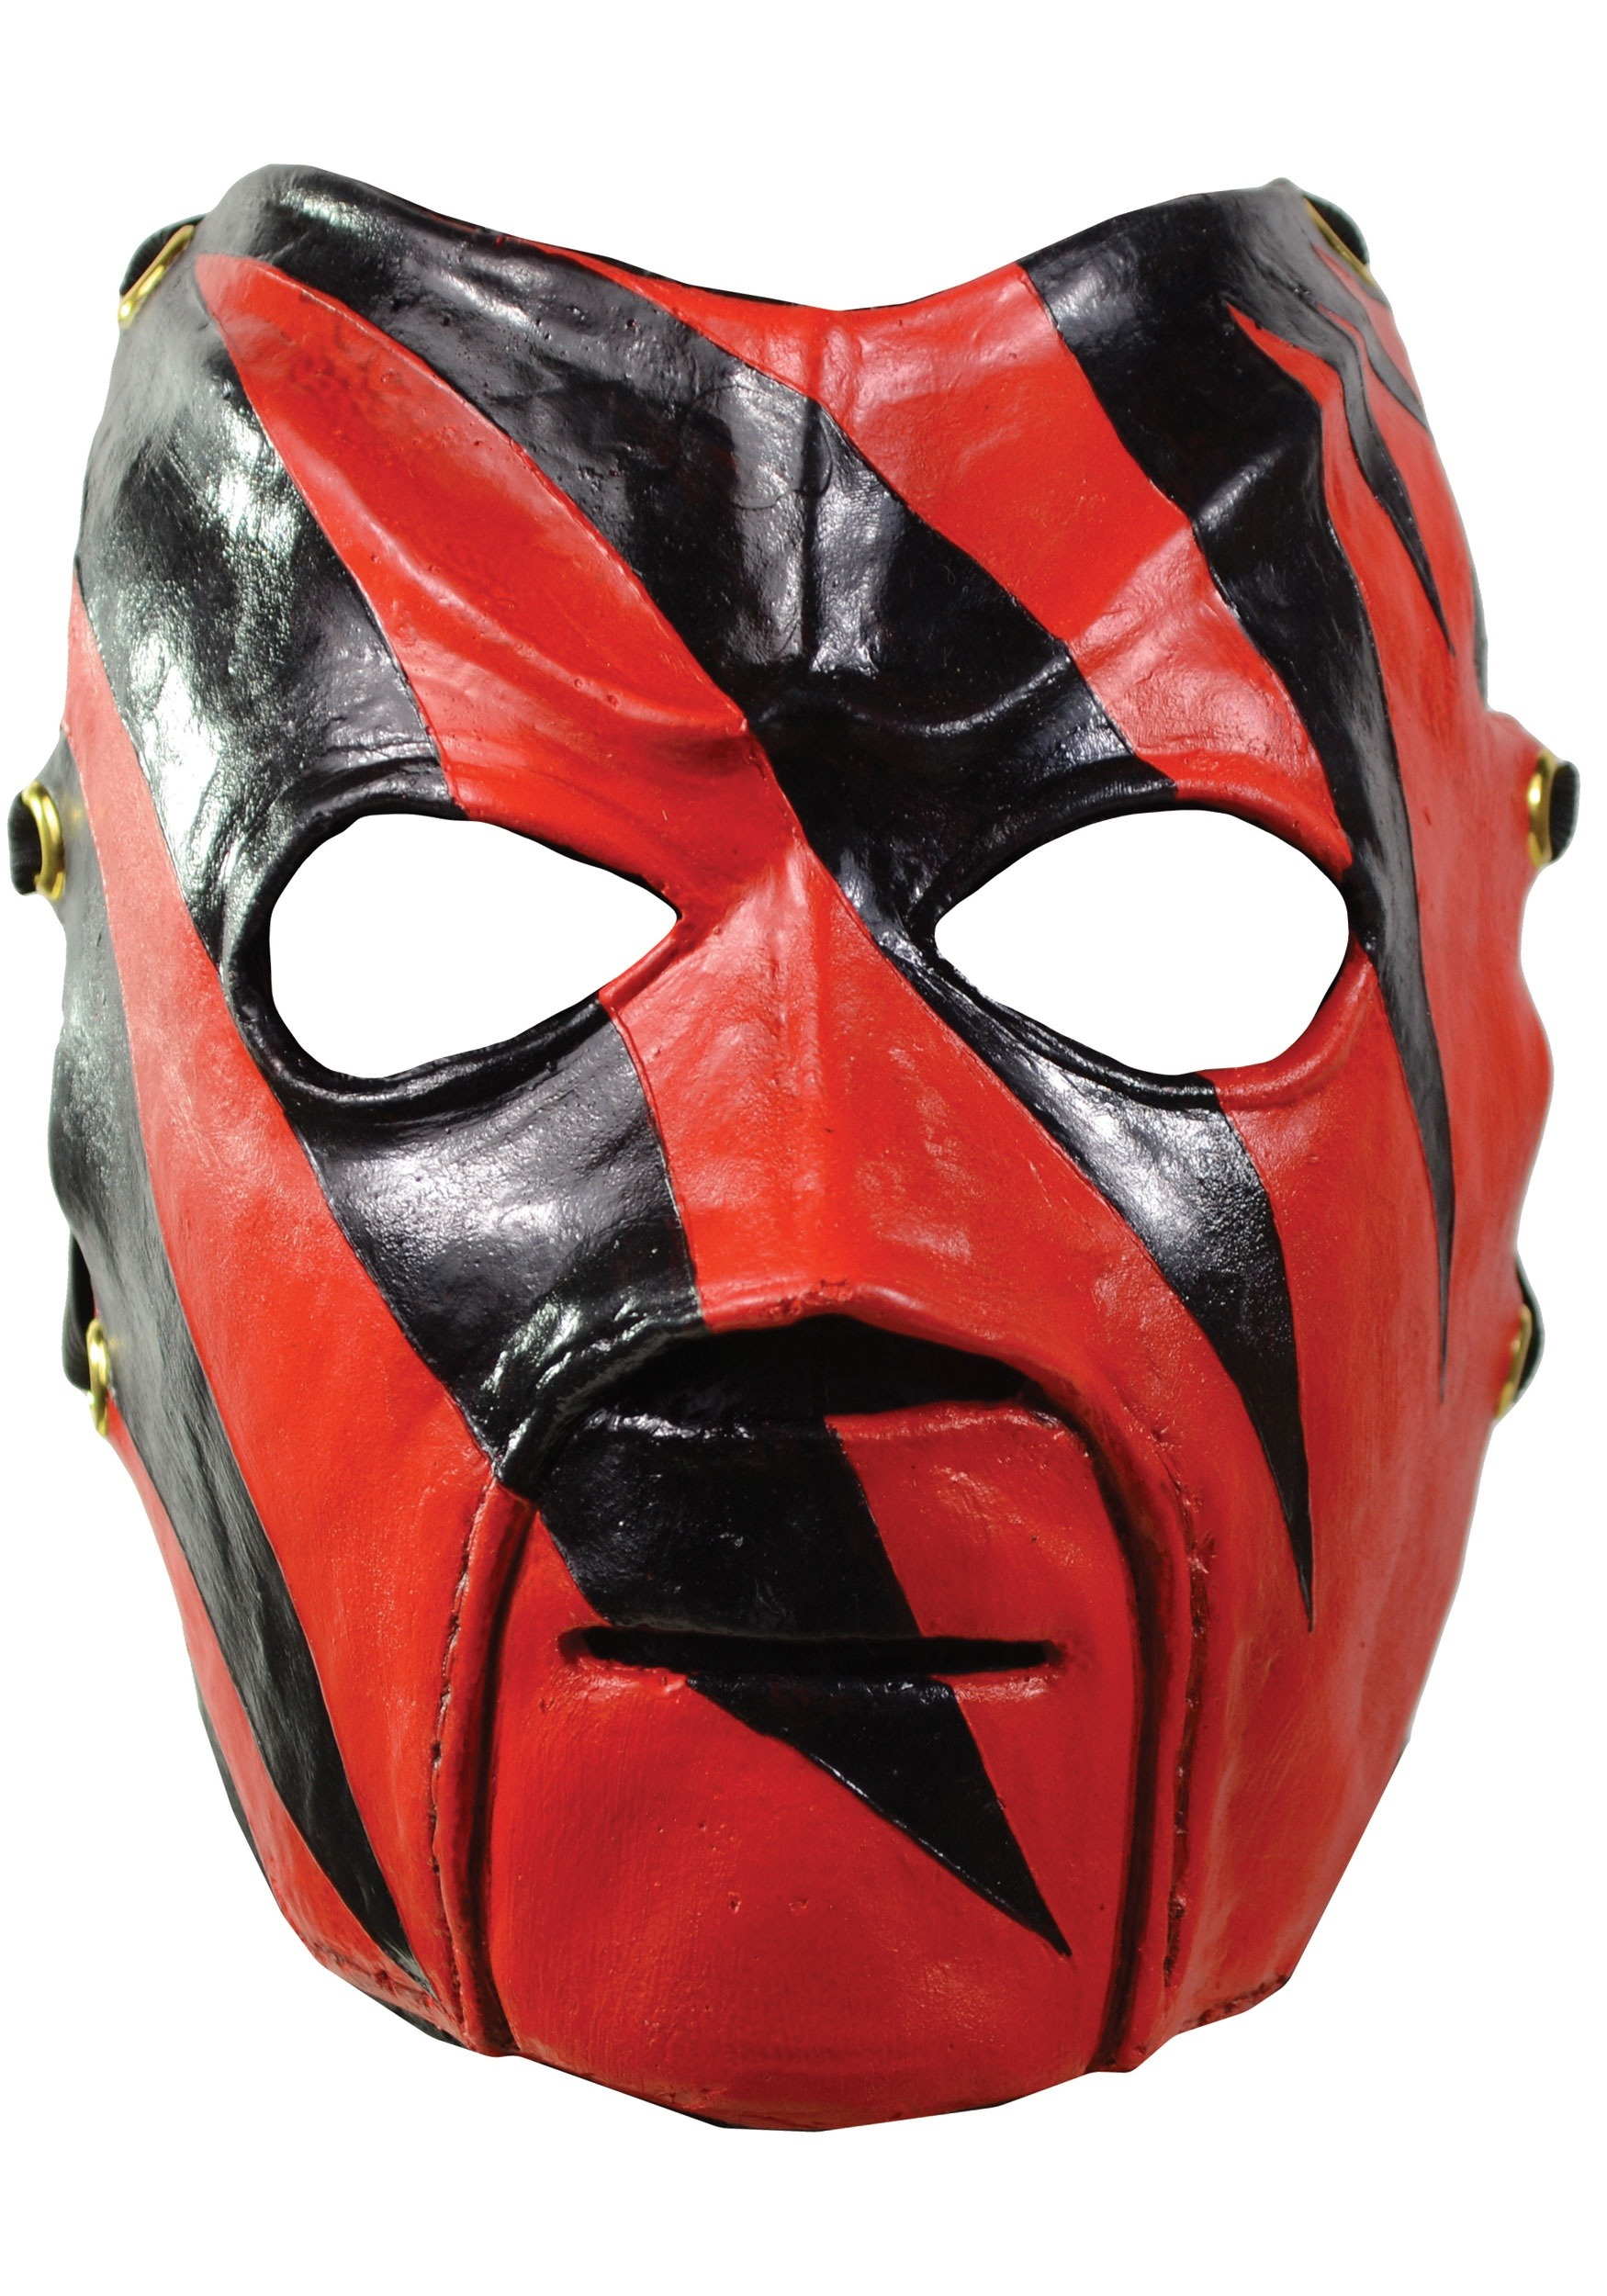 WWE Costumes For Kids & Adults - HalloweenCostumes.com